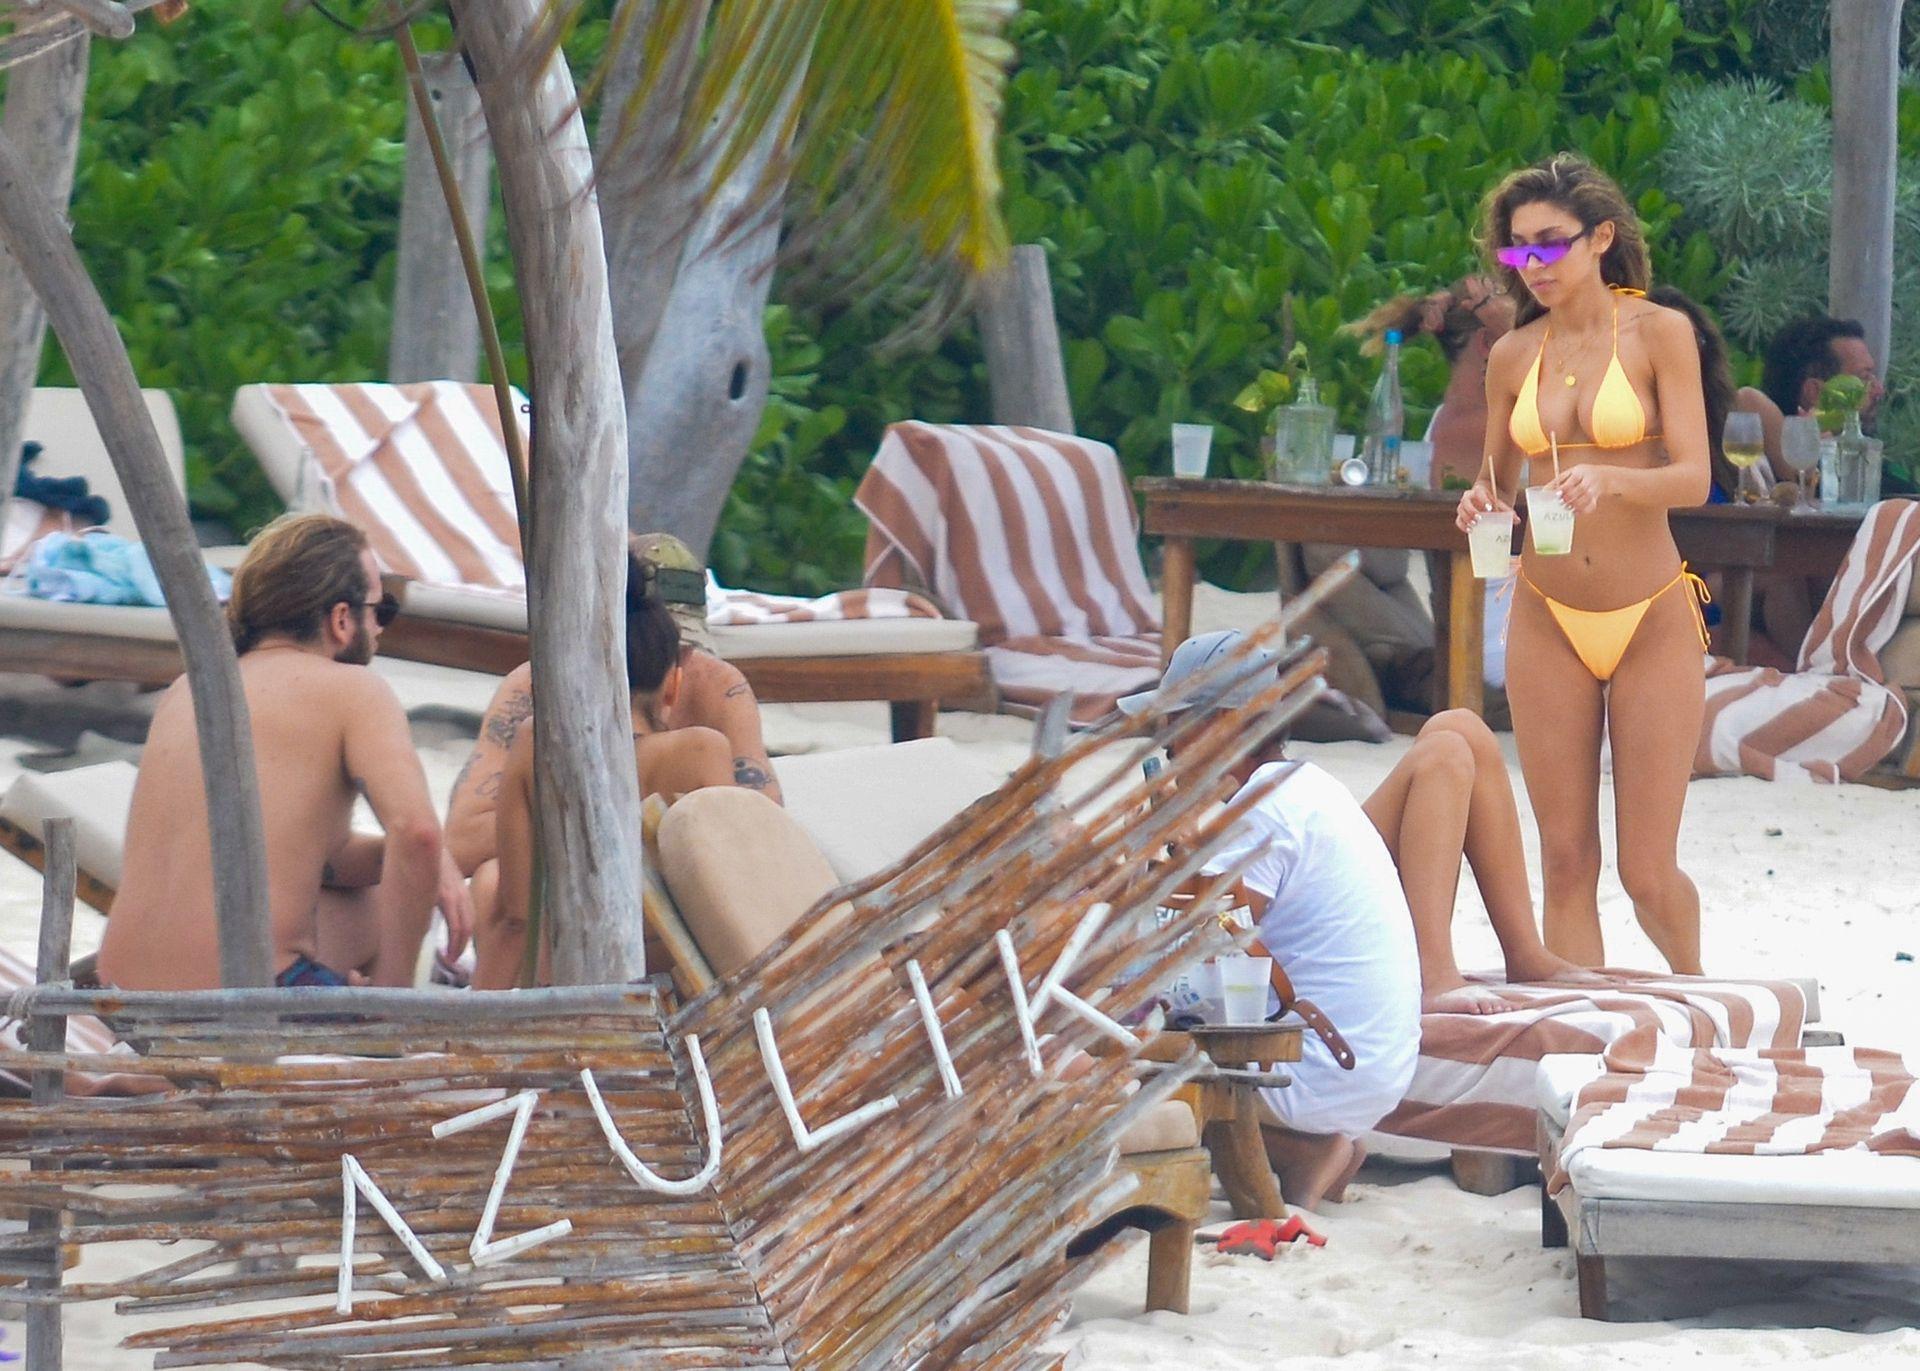 Chantel Jeffries And Dj Diplo Take Their New Love To Mexico 0039